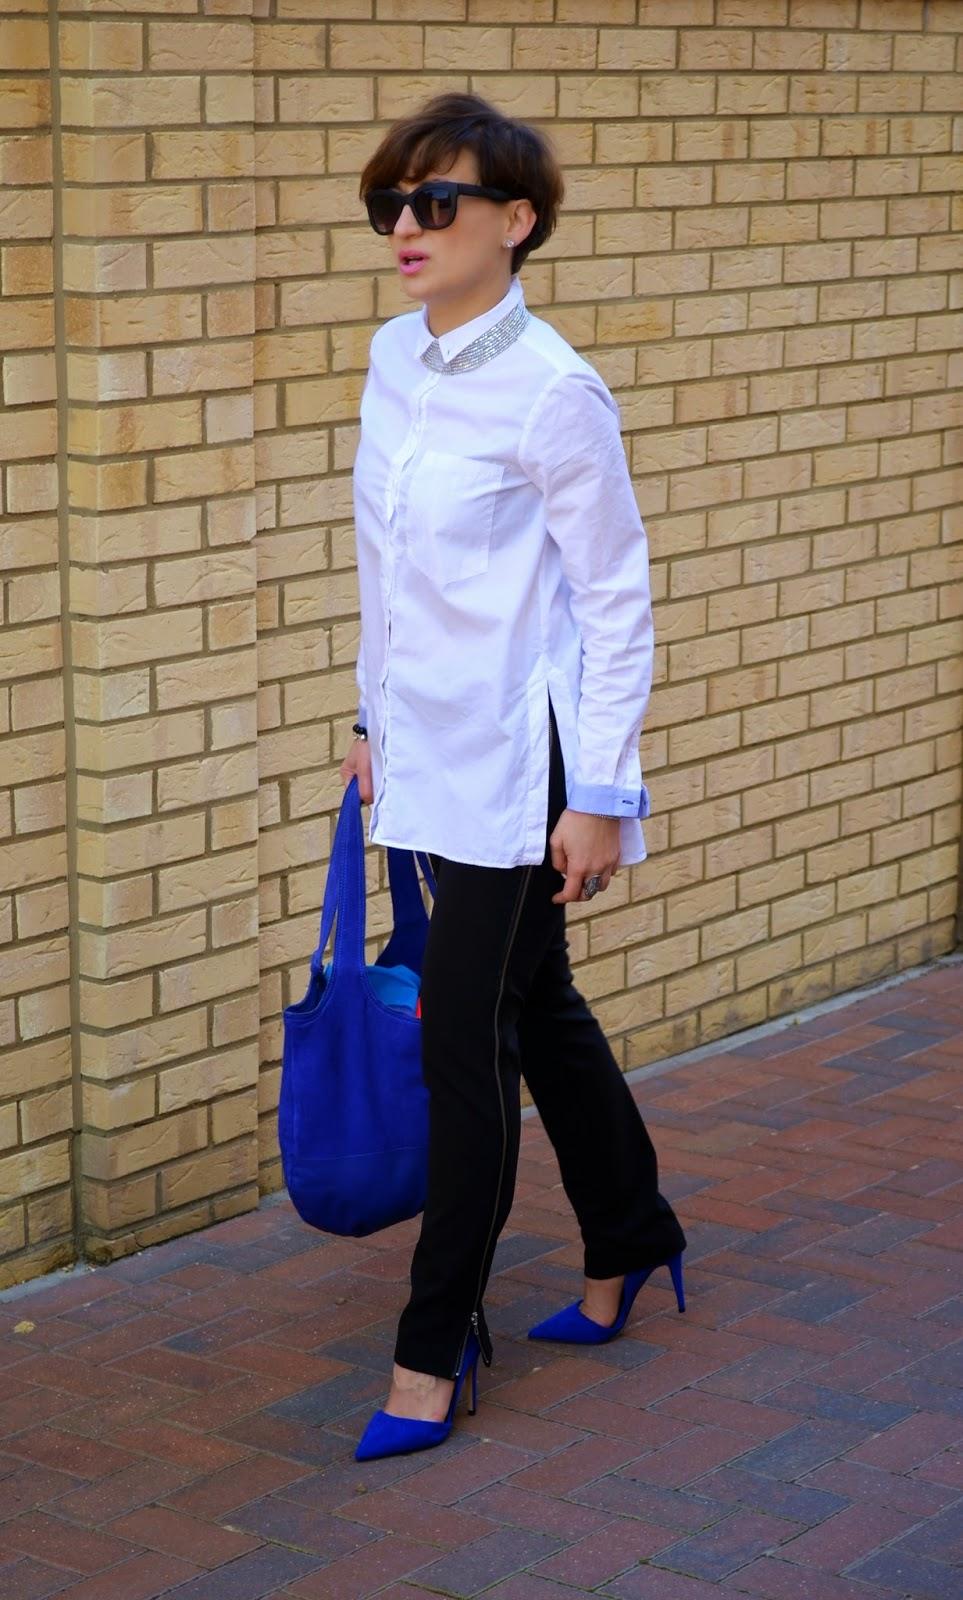 Black & White Classic Look, Fashion, ginatricot, Klasyka ubioru, Kobalt, Kobaltowa Torba, Kobaltowe Szpilki, Koral, moda, Sexi Zipped ZARA Black Trousers, Srebrne Dodatki, White ZARA shirt